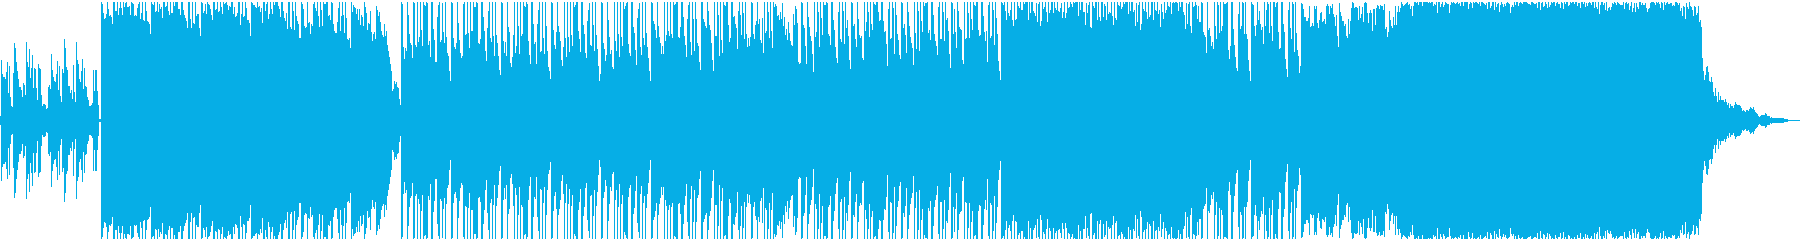 Hiphop/Chill/Lo-Fiの再生済みの波形